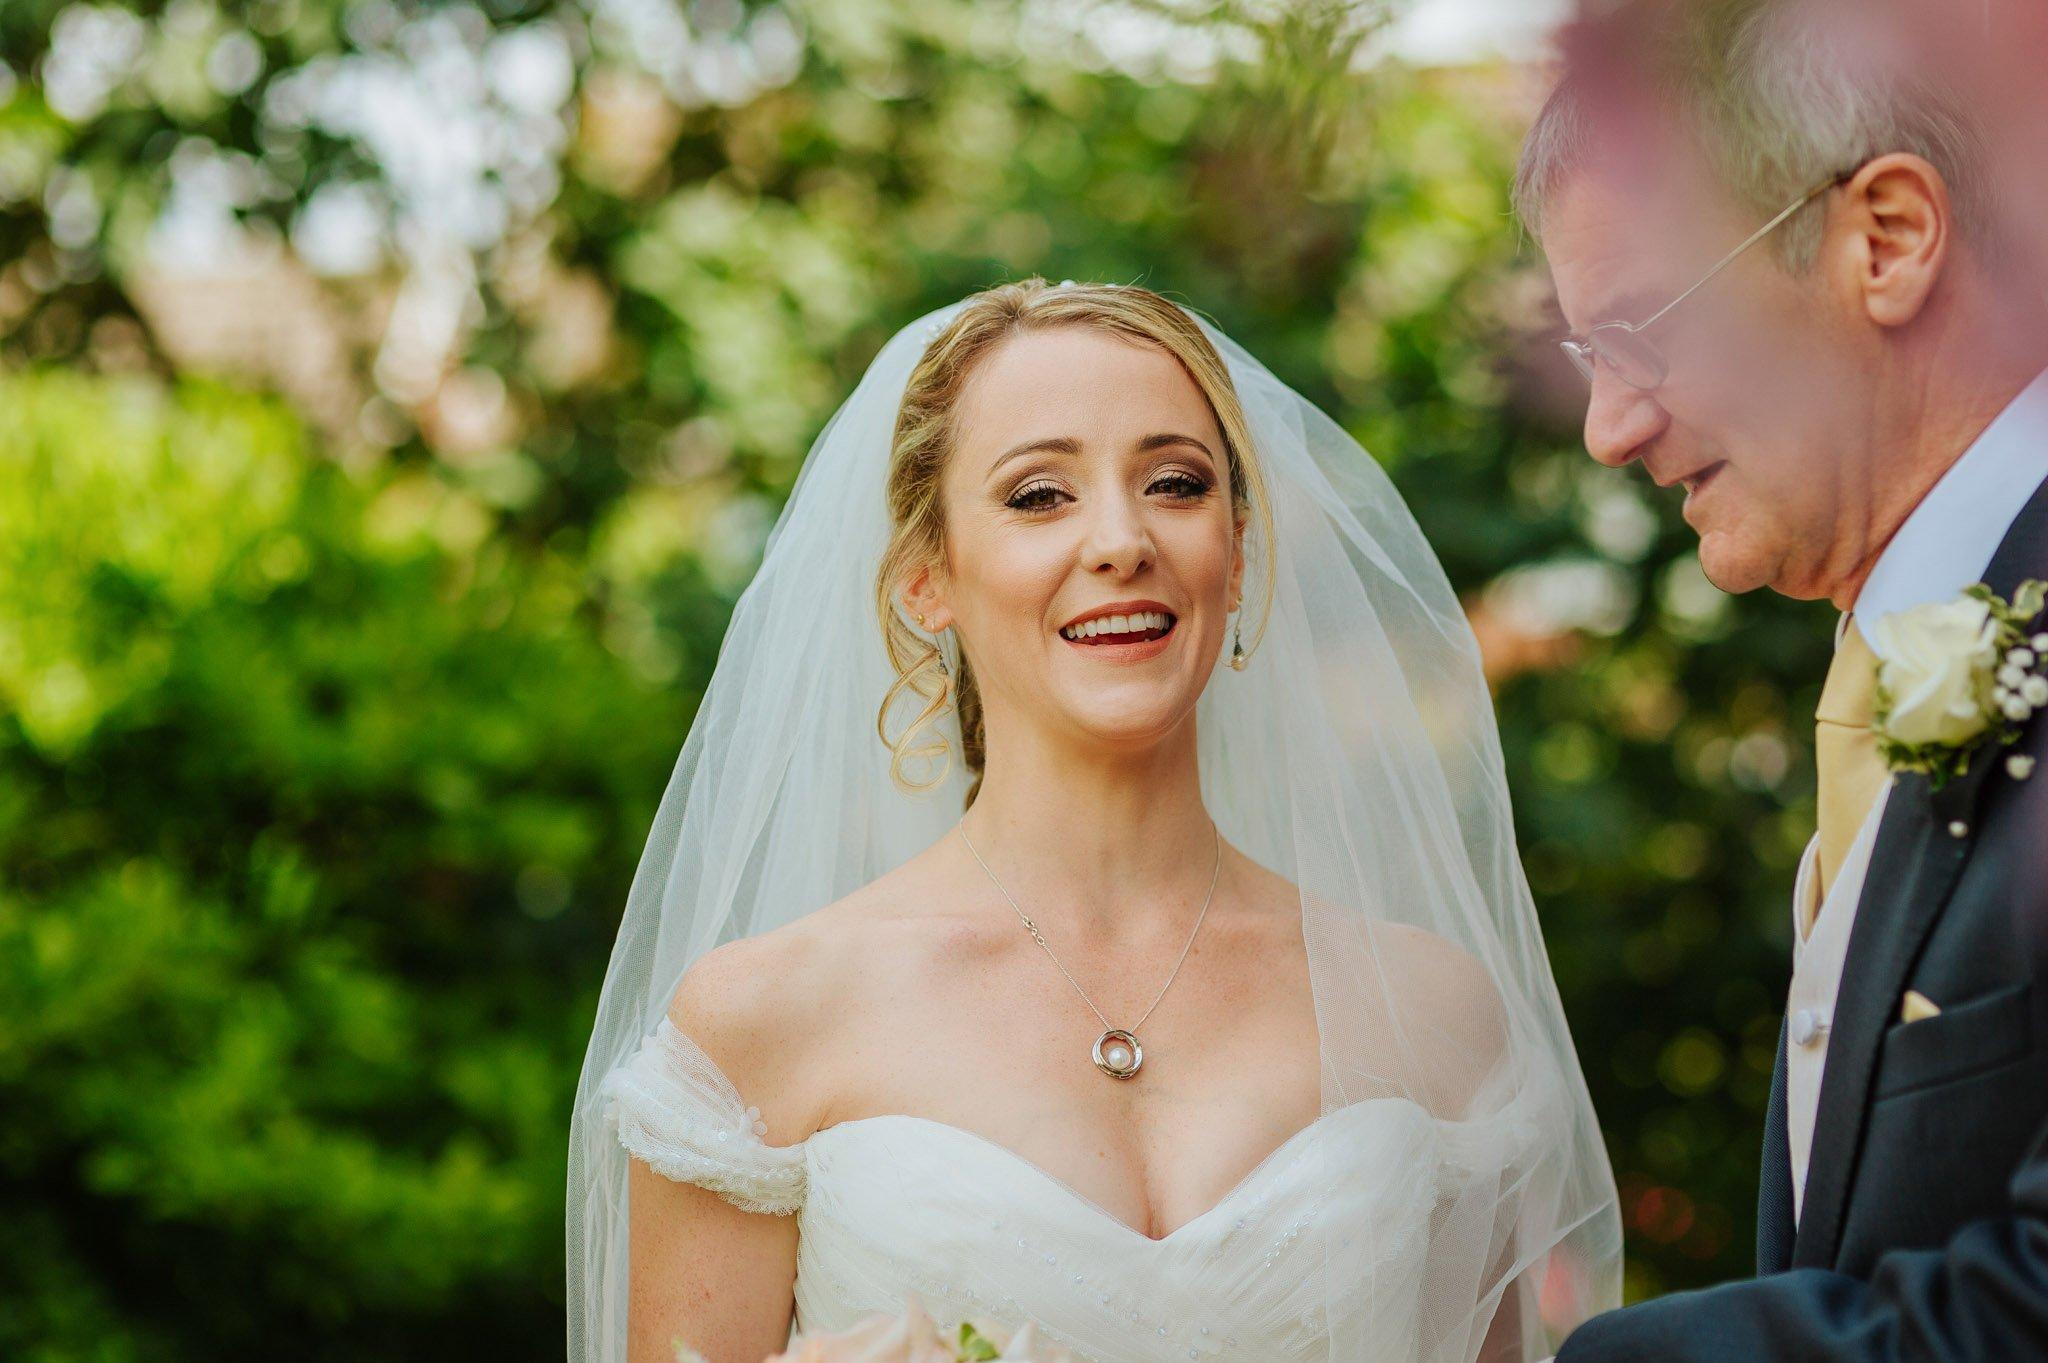 Georgina + Mike - Wedding photography in Malvern, Worcestershire 34